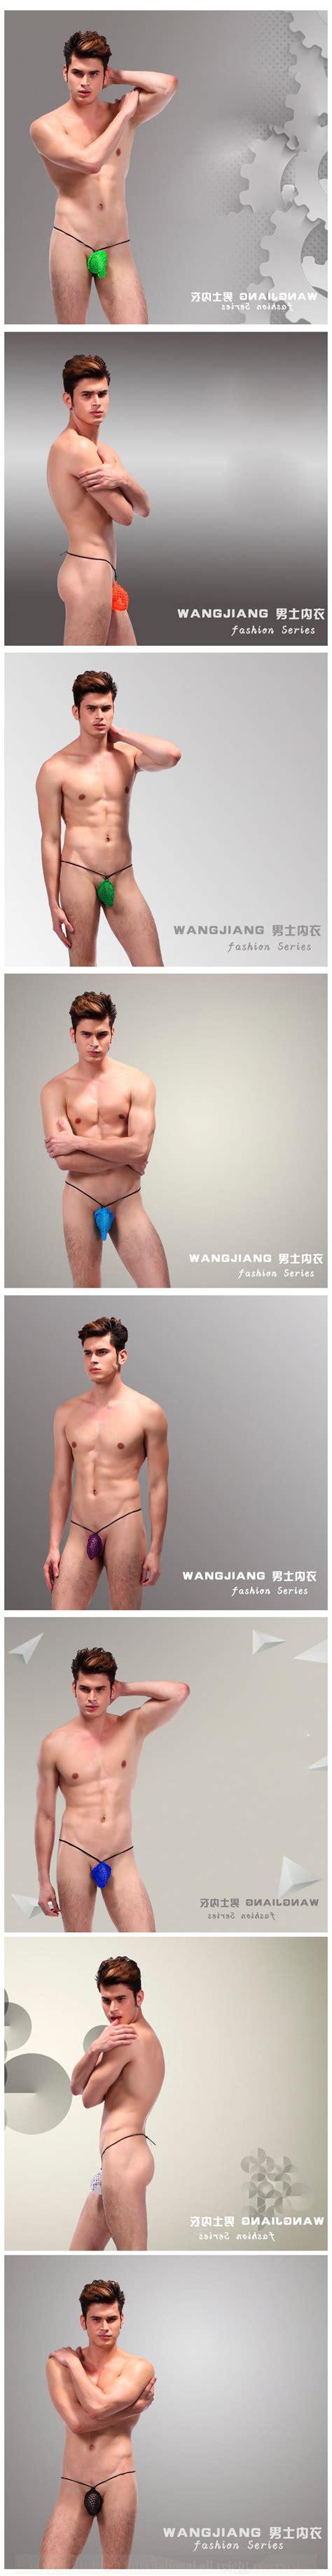 public view of men in thongs men s sexy g string thongs bikini open underwear bag bulge